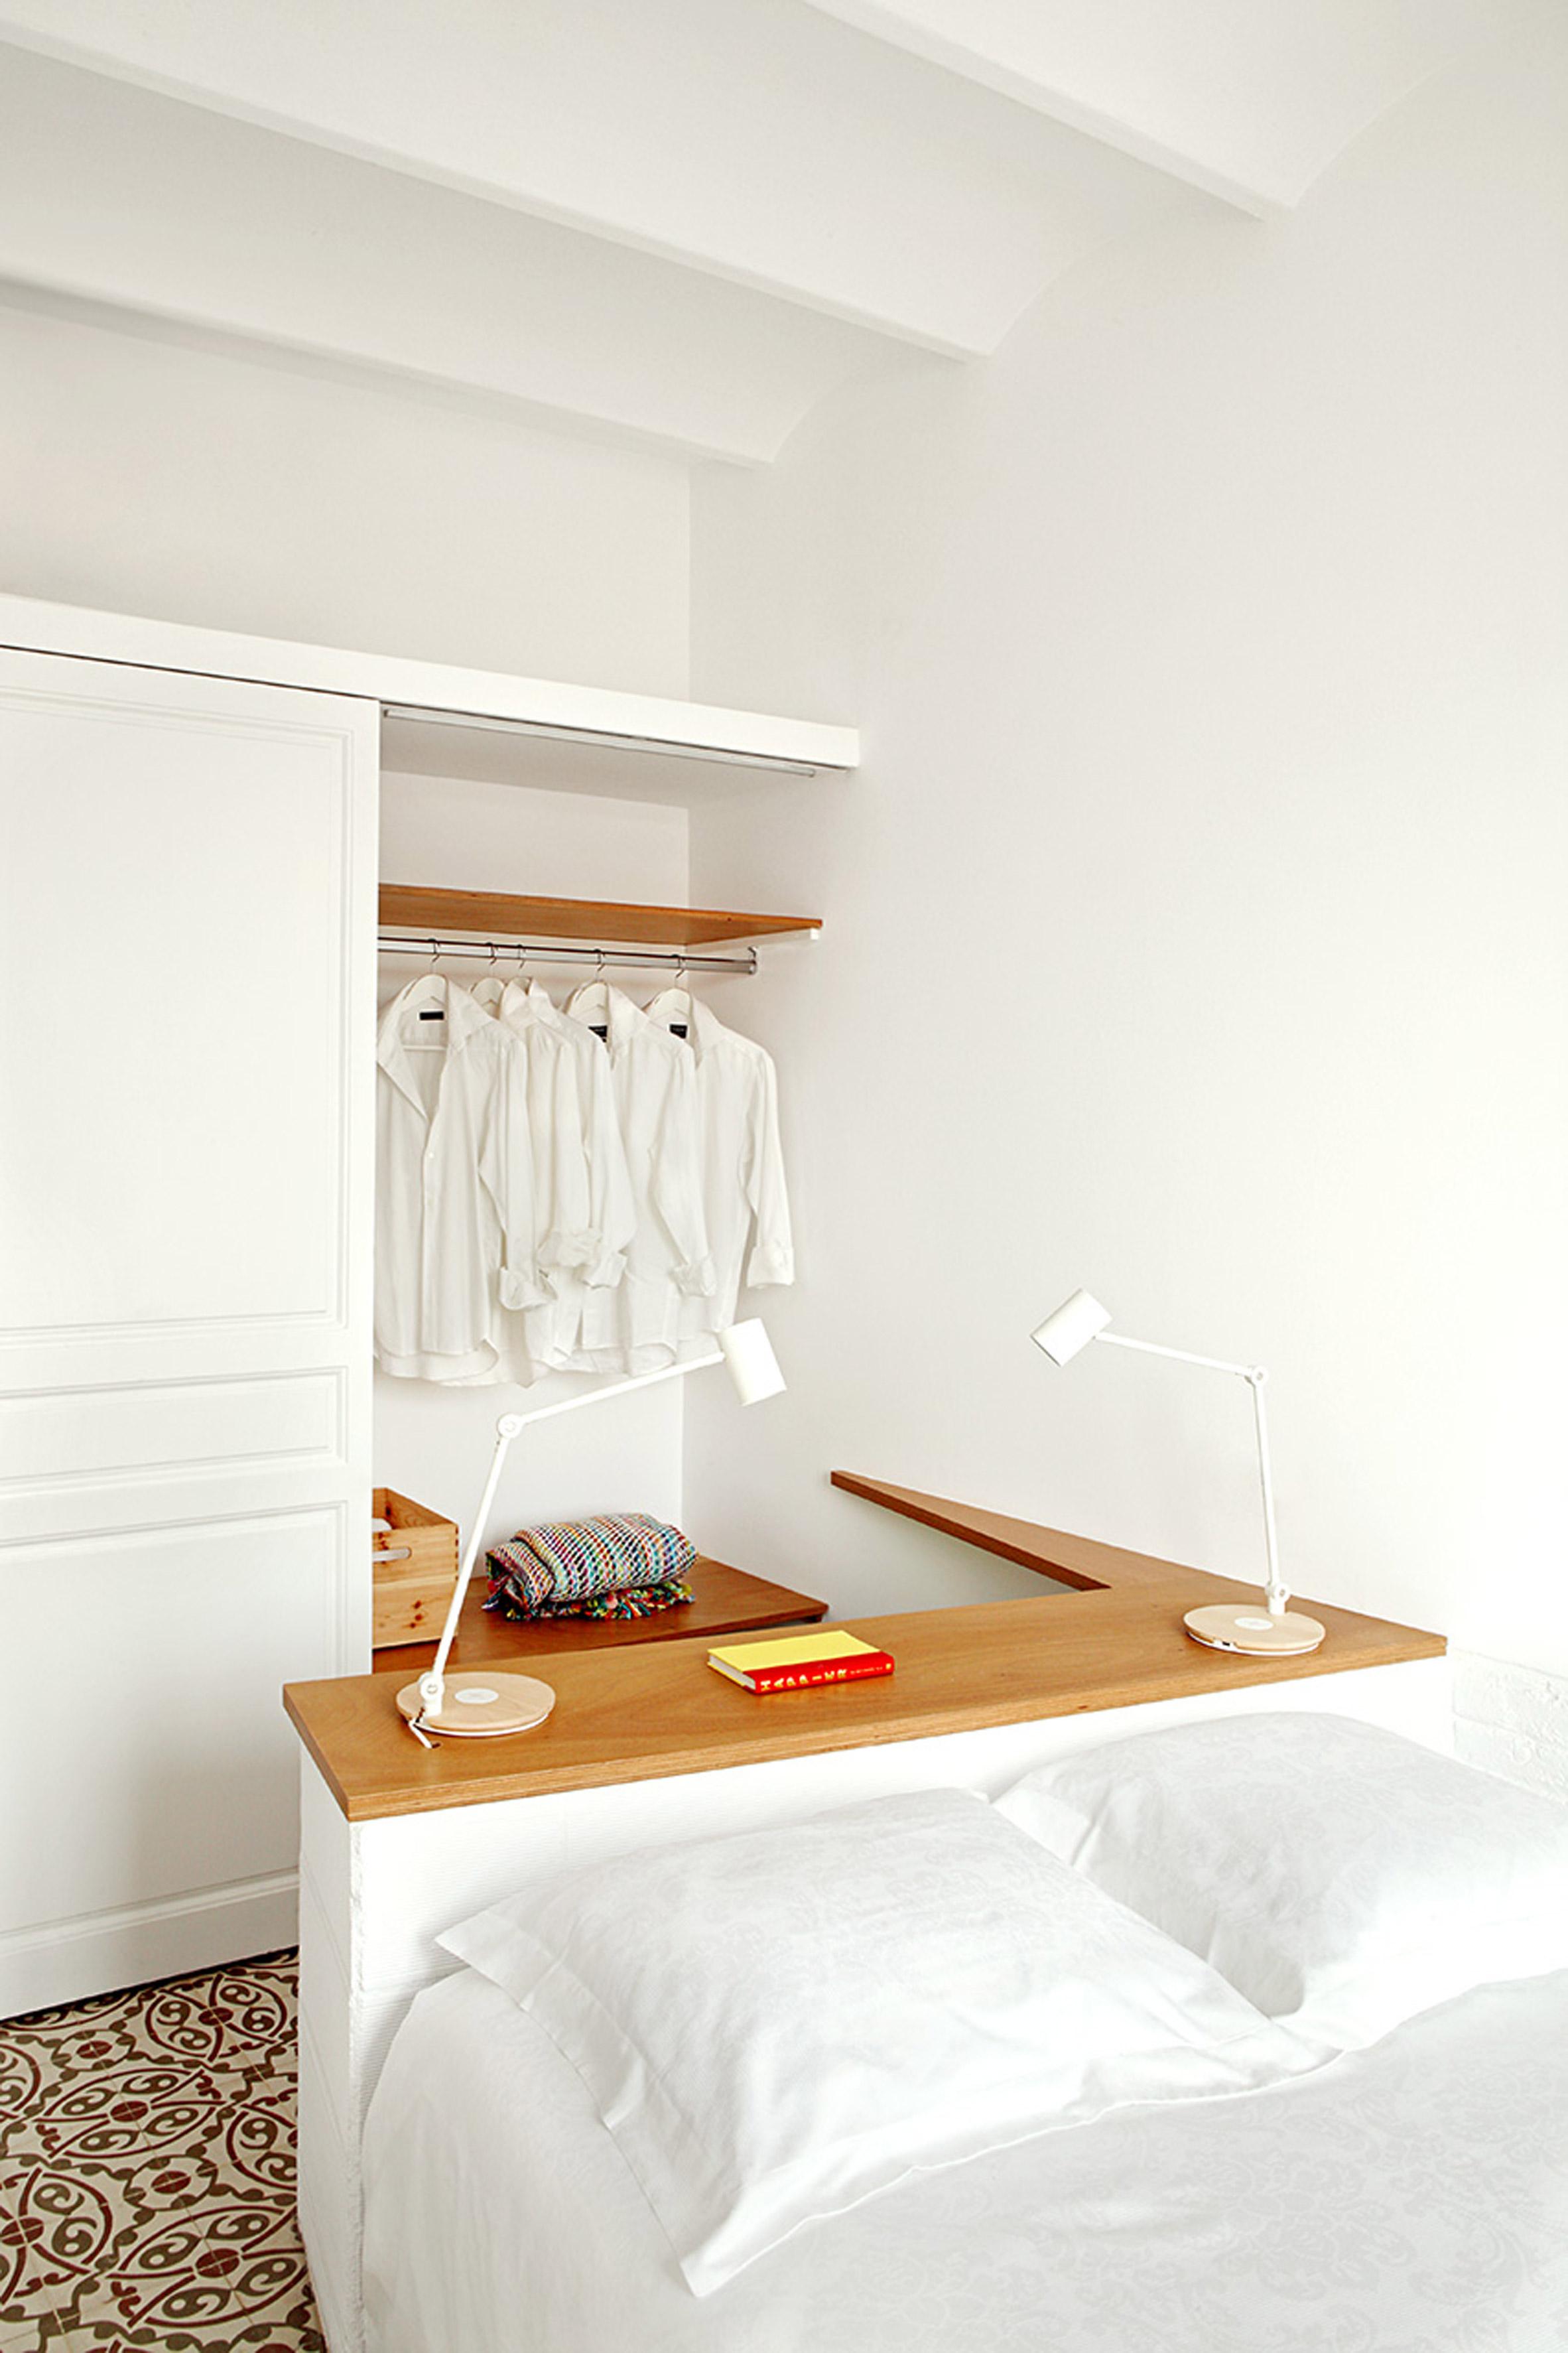 https://static.dezeen.com/uploads/2016/10/piso-pereiv44-miel-arquitectos-interiors-barcelona-apartment-residential_dezeen_2364_col_13.jpg